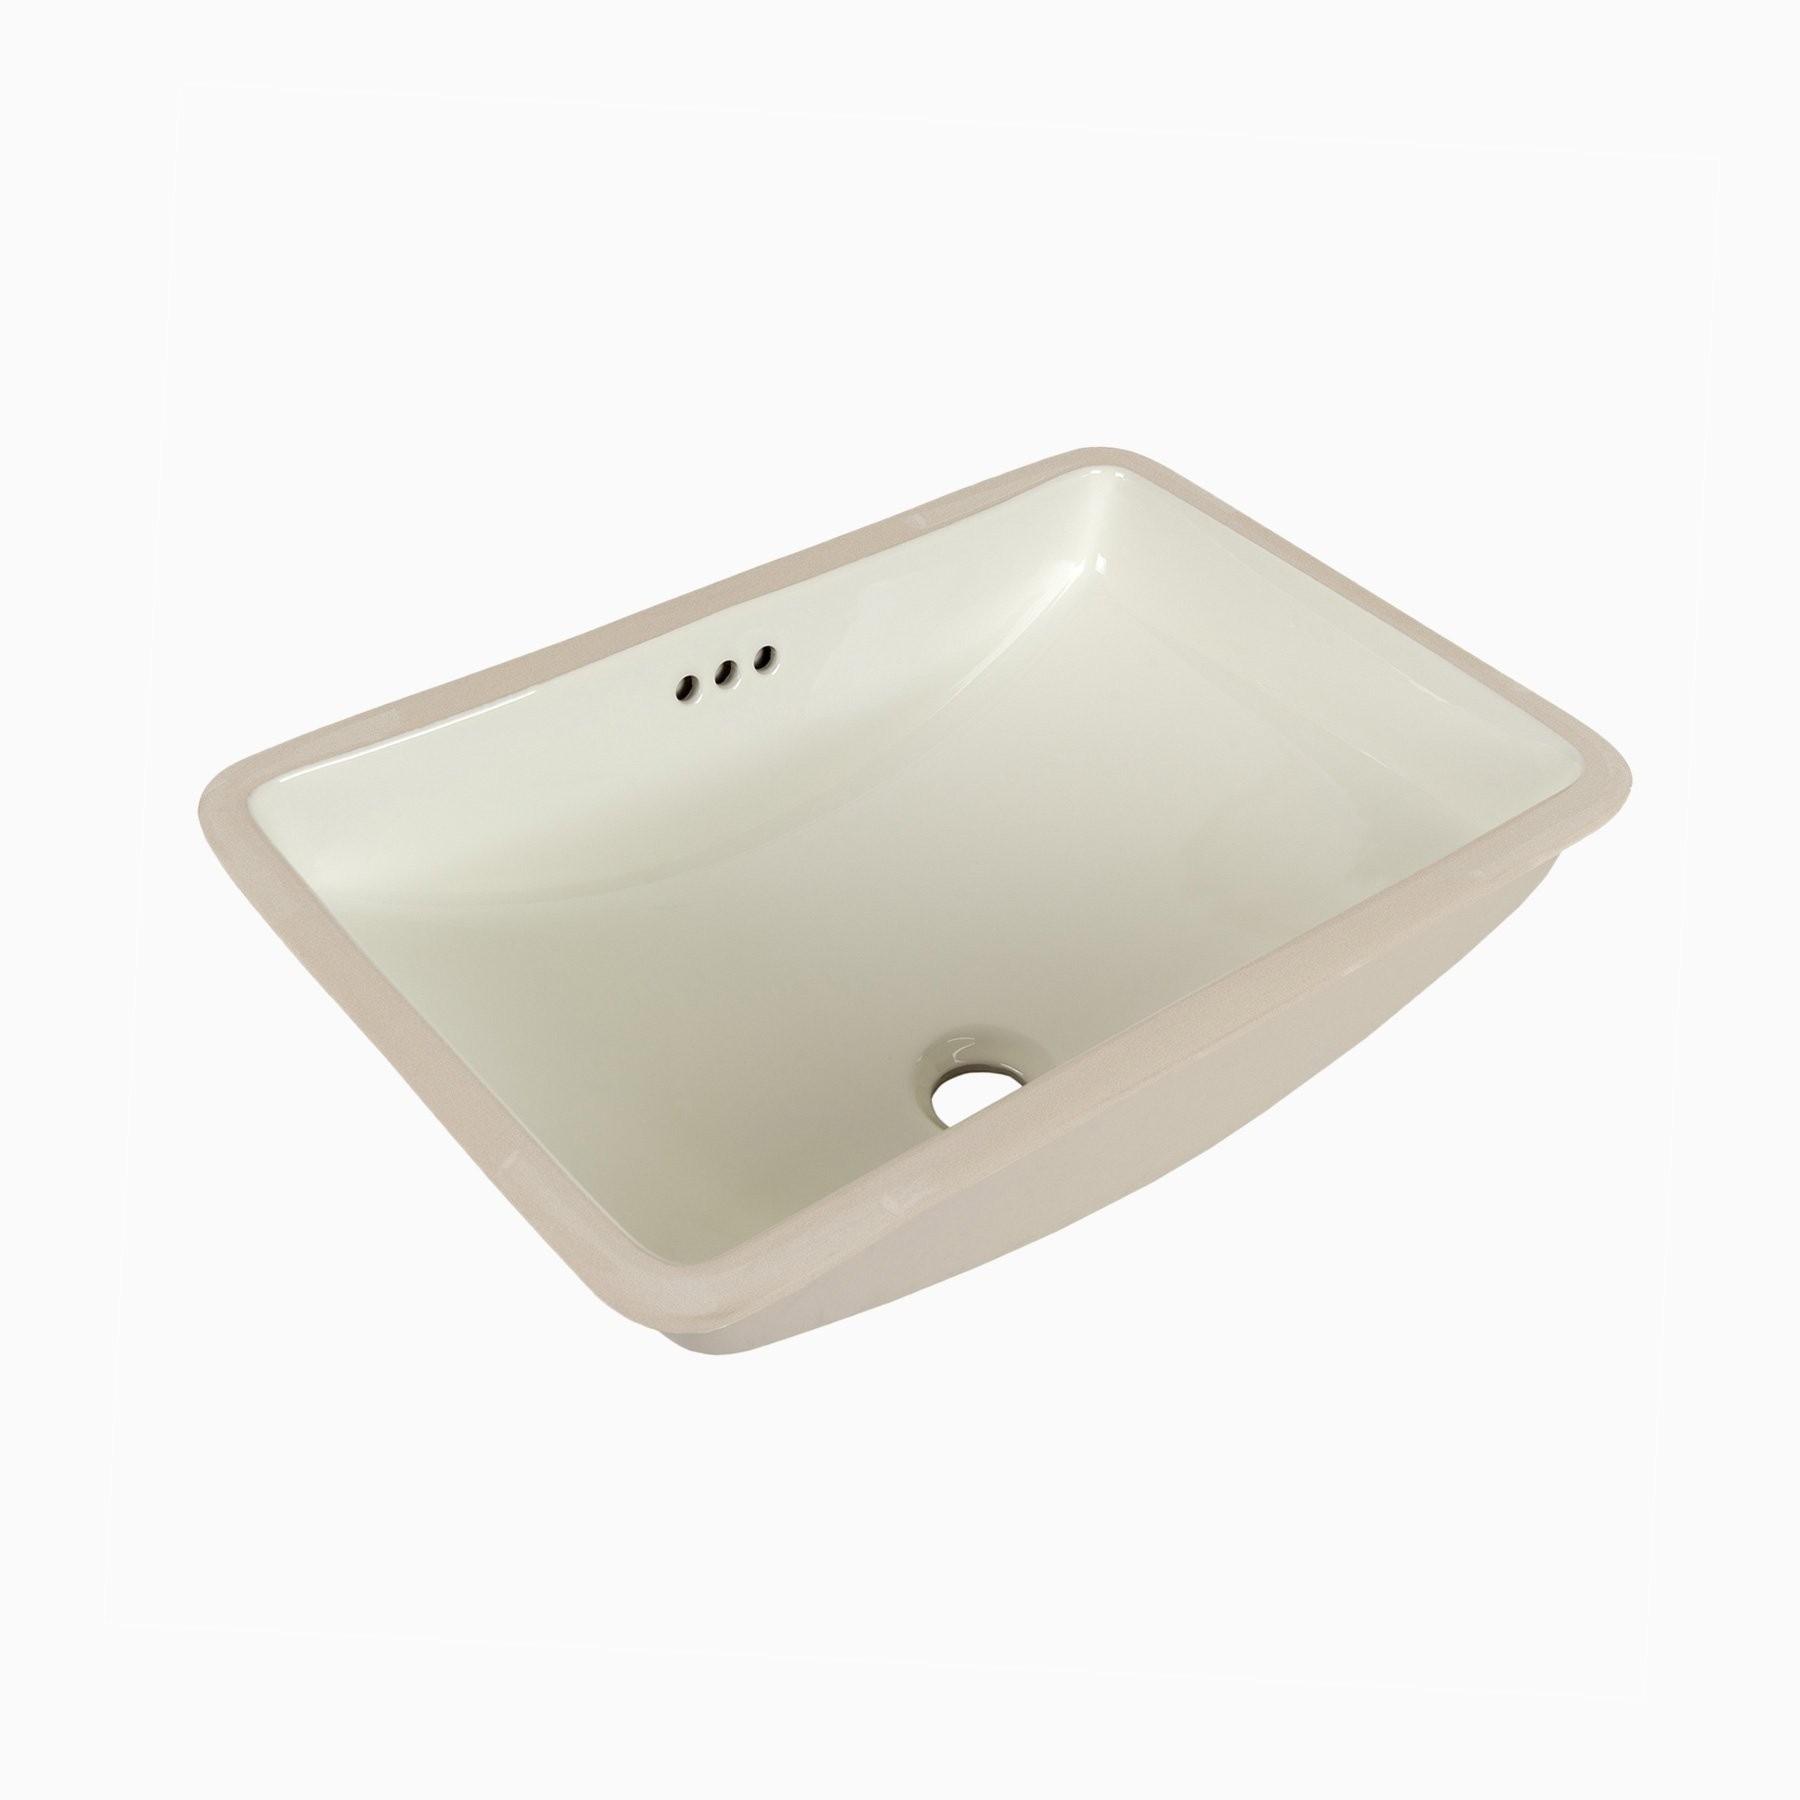 Bristol Ceramic Single Sink Undermount Bathroom Sink, Rectangle